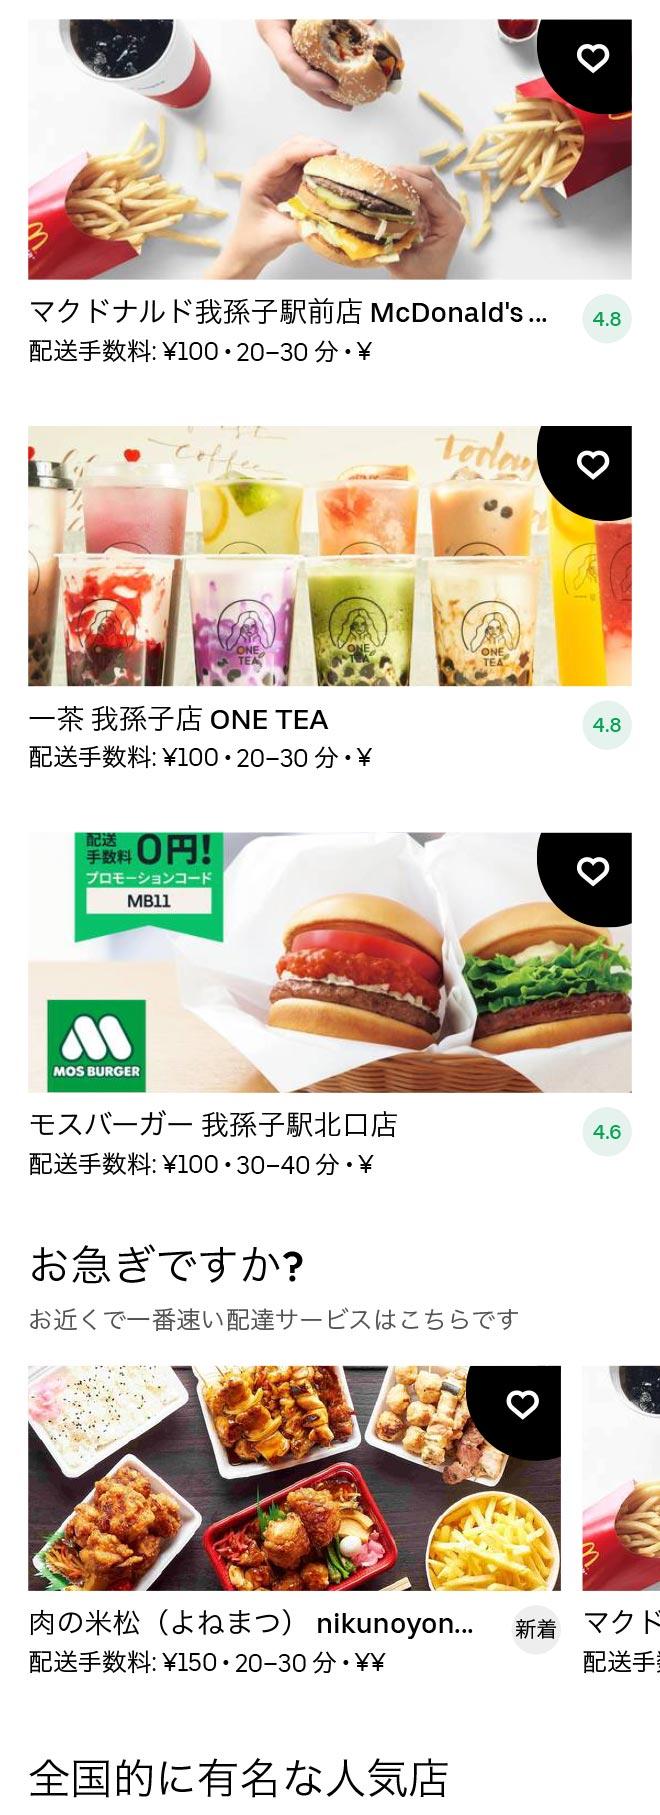 Abiko menu 2011 01